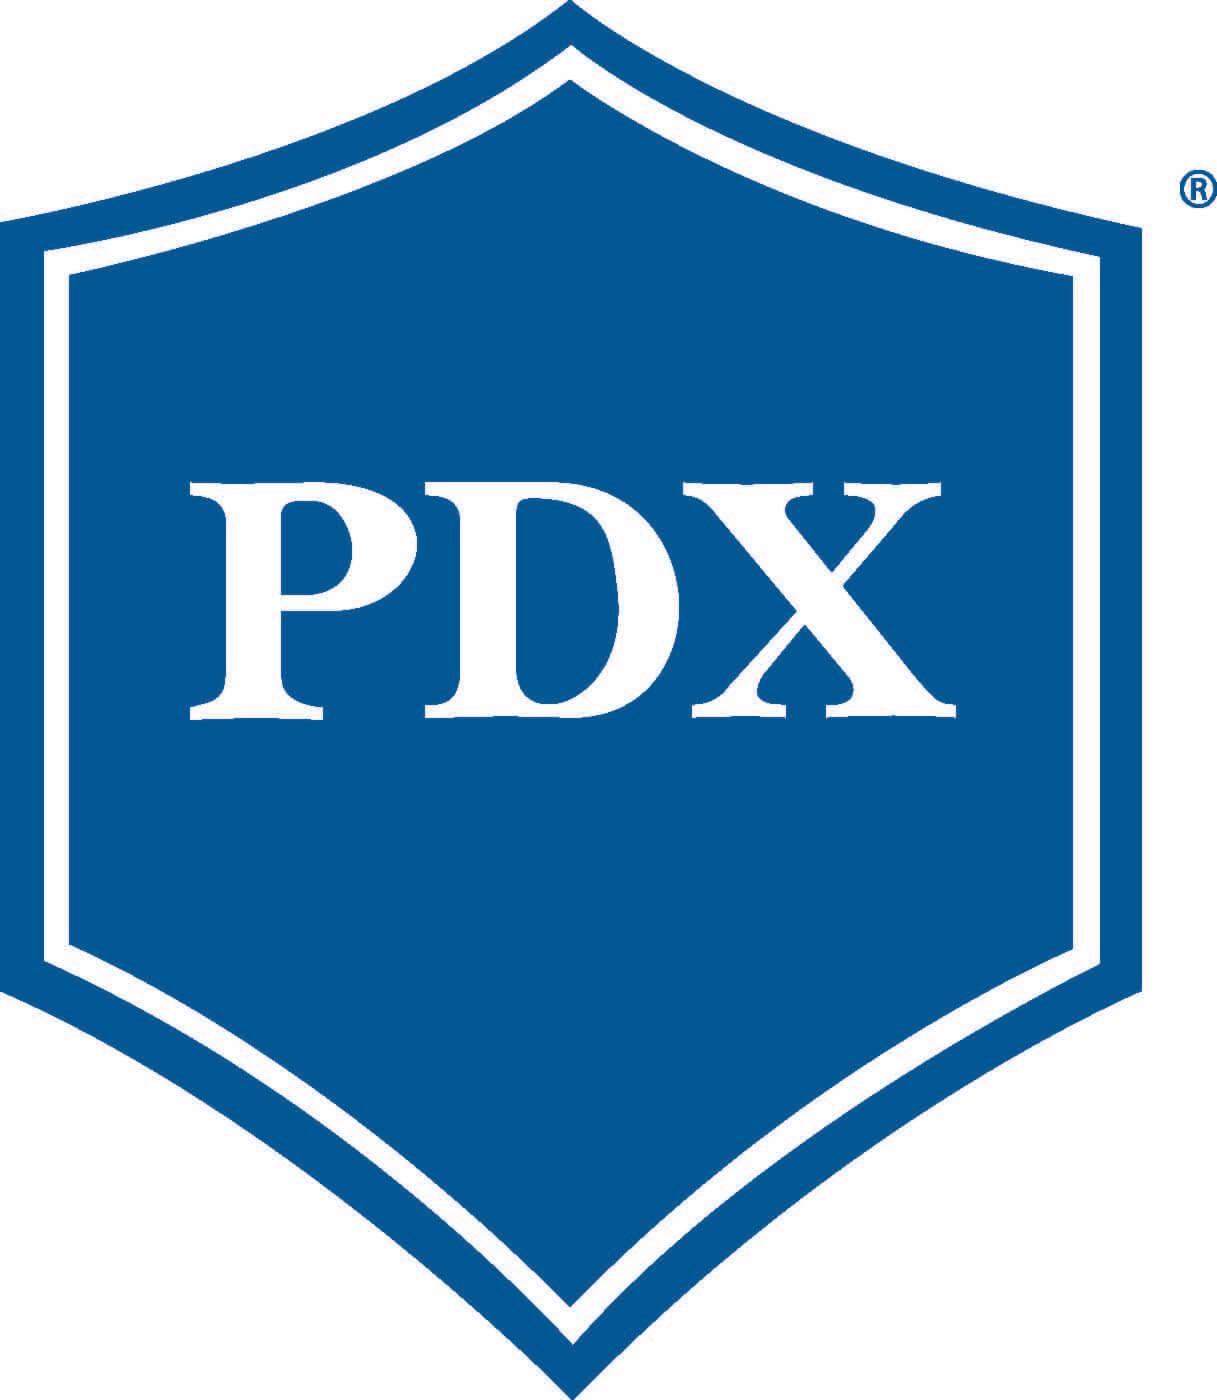 PDX-NHIN-Rx.com